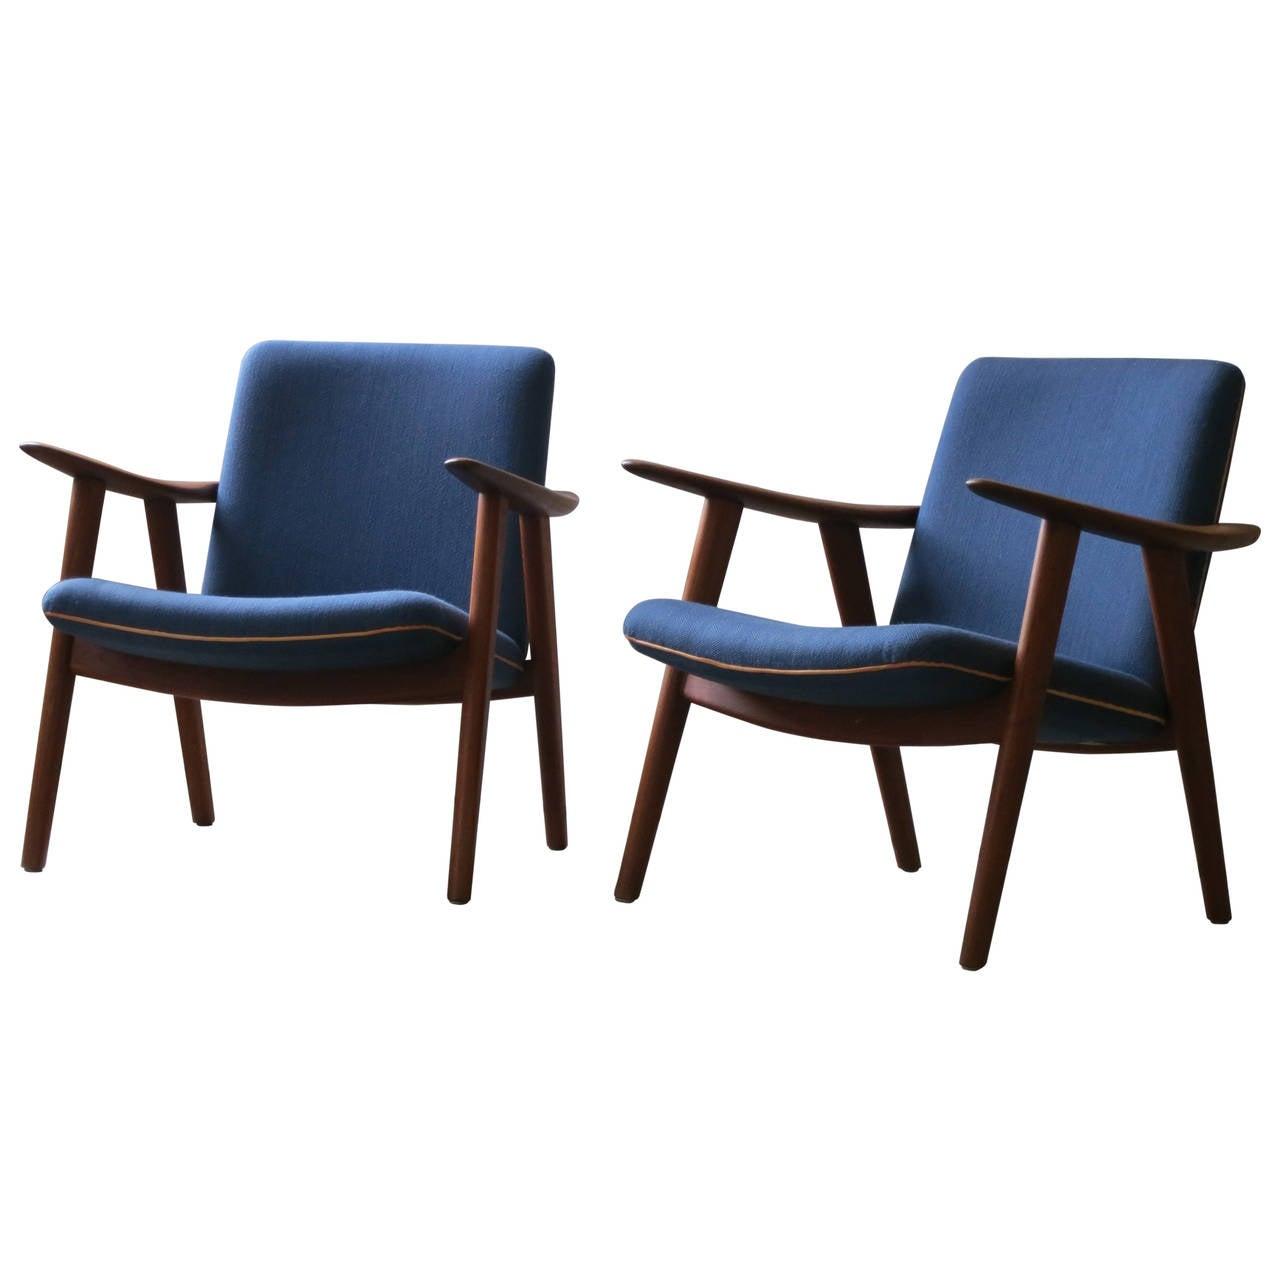 "Pair of Teak ""Sawbuck"" Chairs by Hans Wegner For Sale"